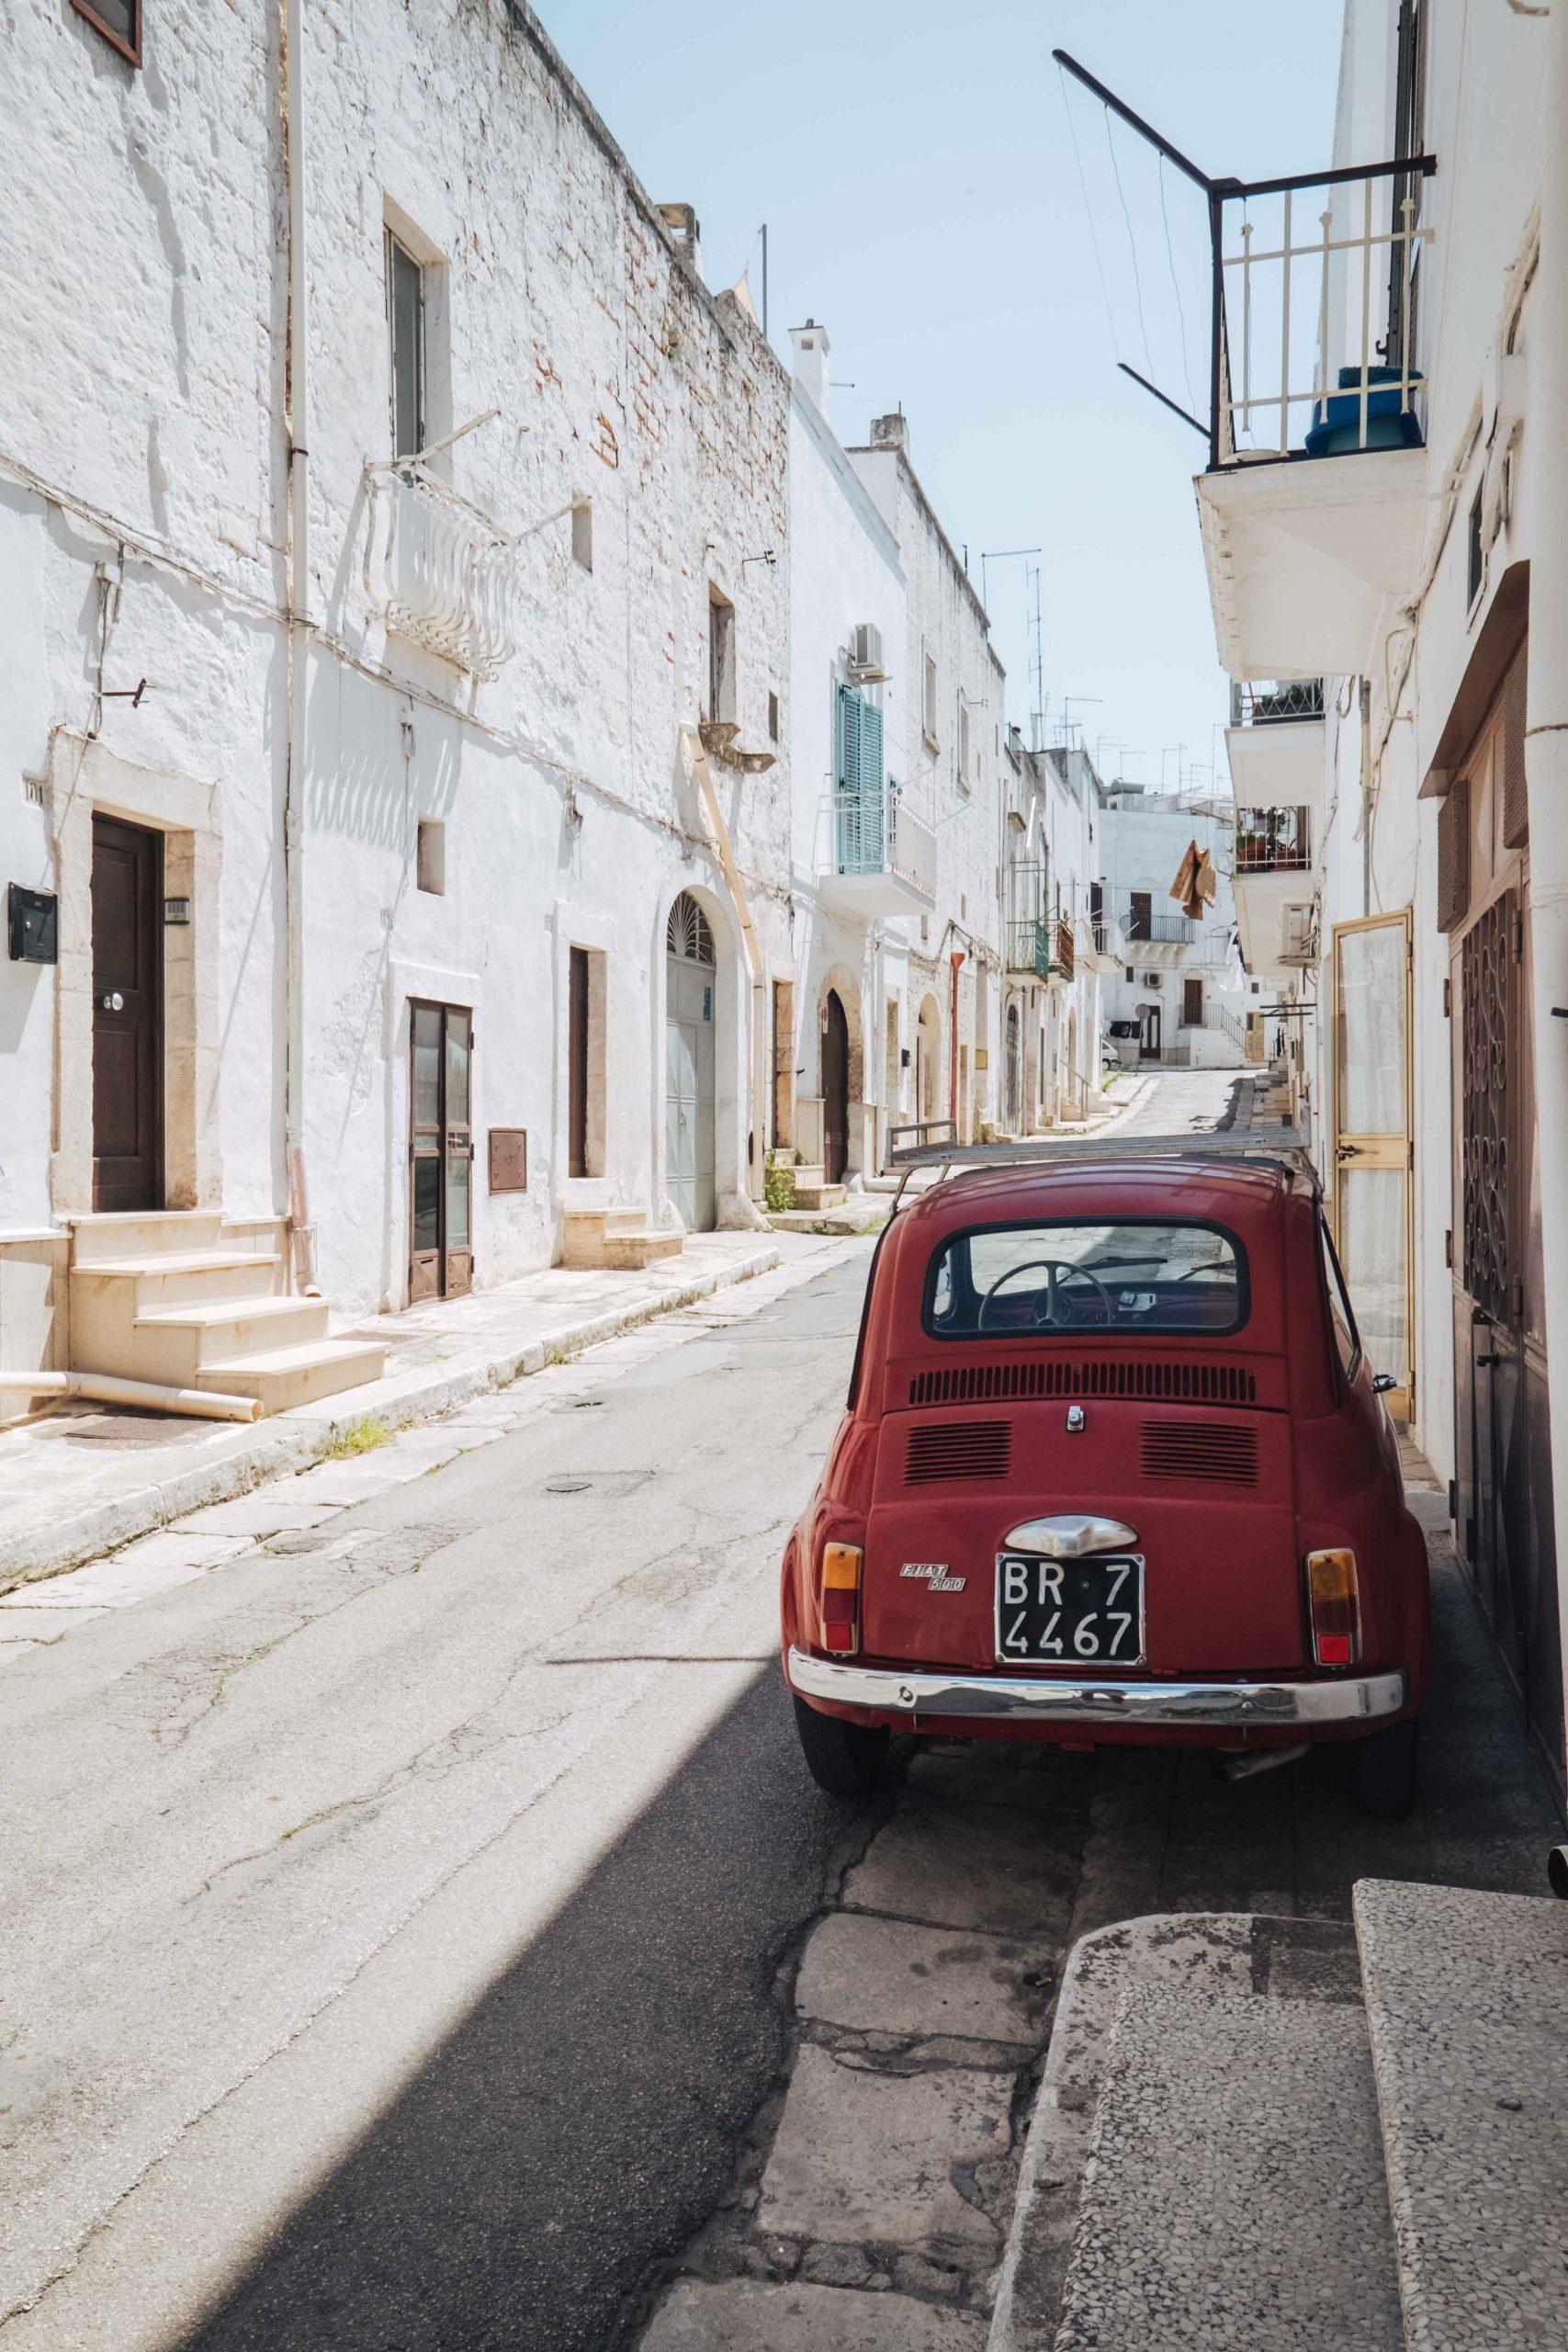 Ostuni, dubbed the Città Bianca (White City) is a UNESCO World Heritage Site | A 7-day Road Trip Through Puglia | Mondomulia